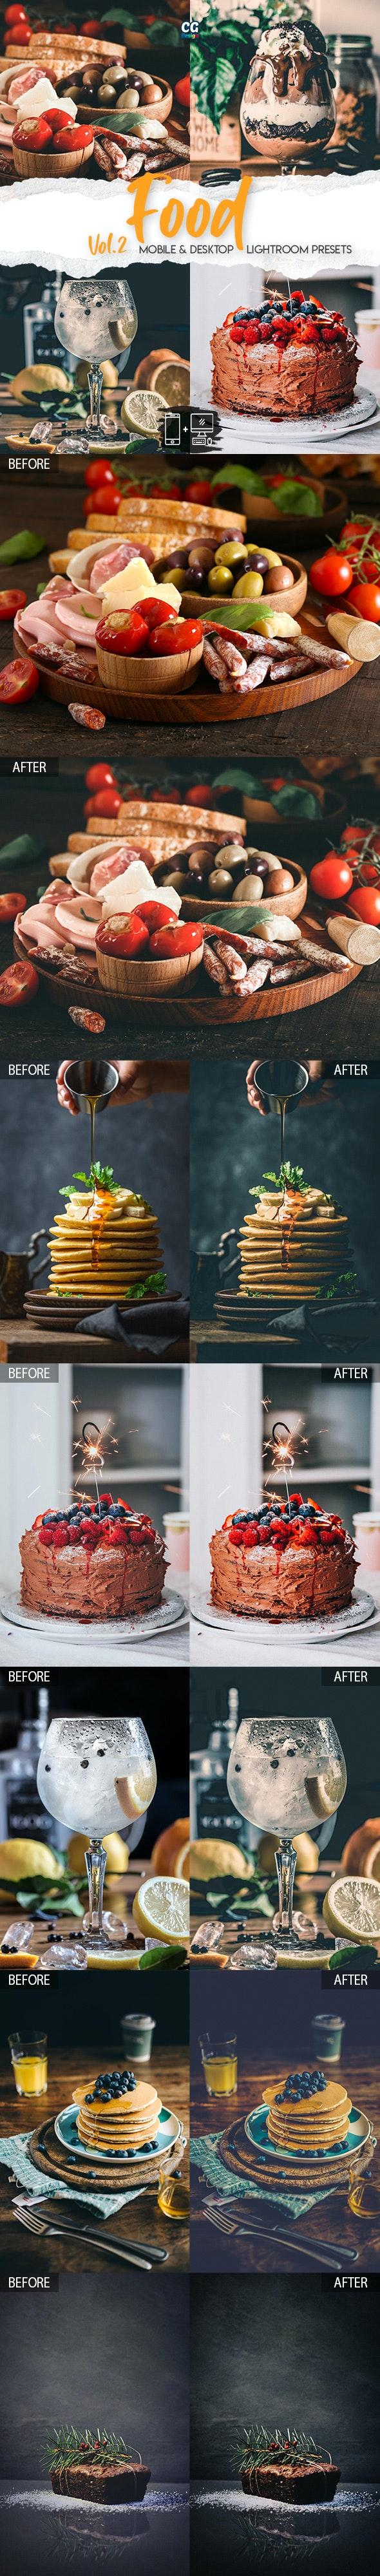 Food Lightroom Presets Vol. 2 - 15 Premium Lightroom Presets - Lightroom Presets Add-ons